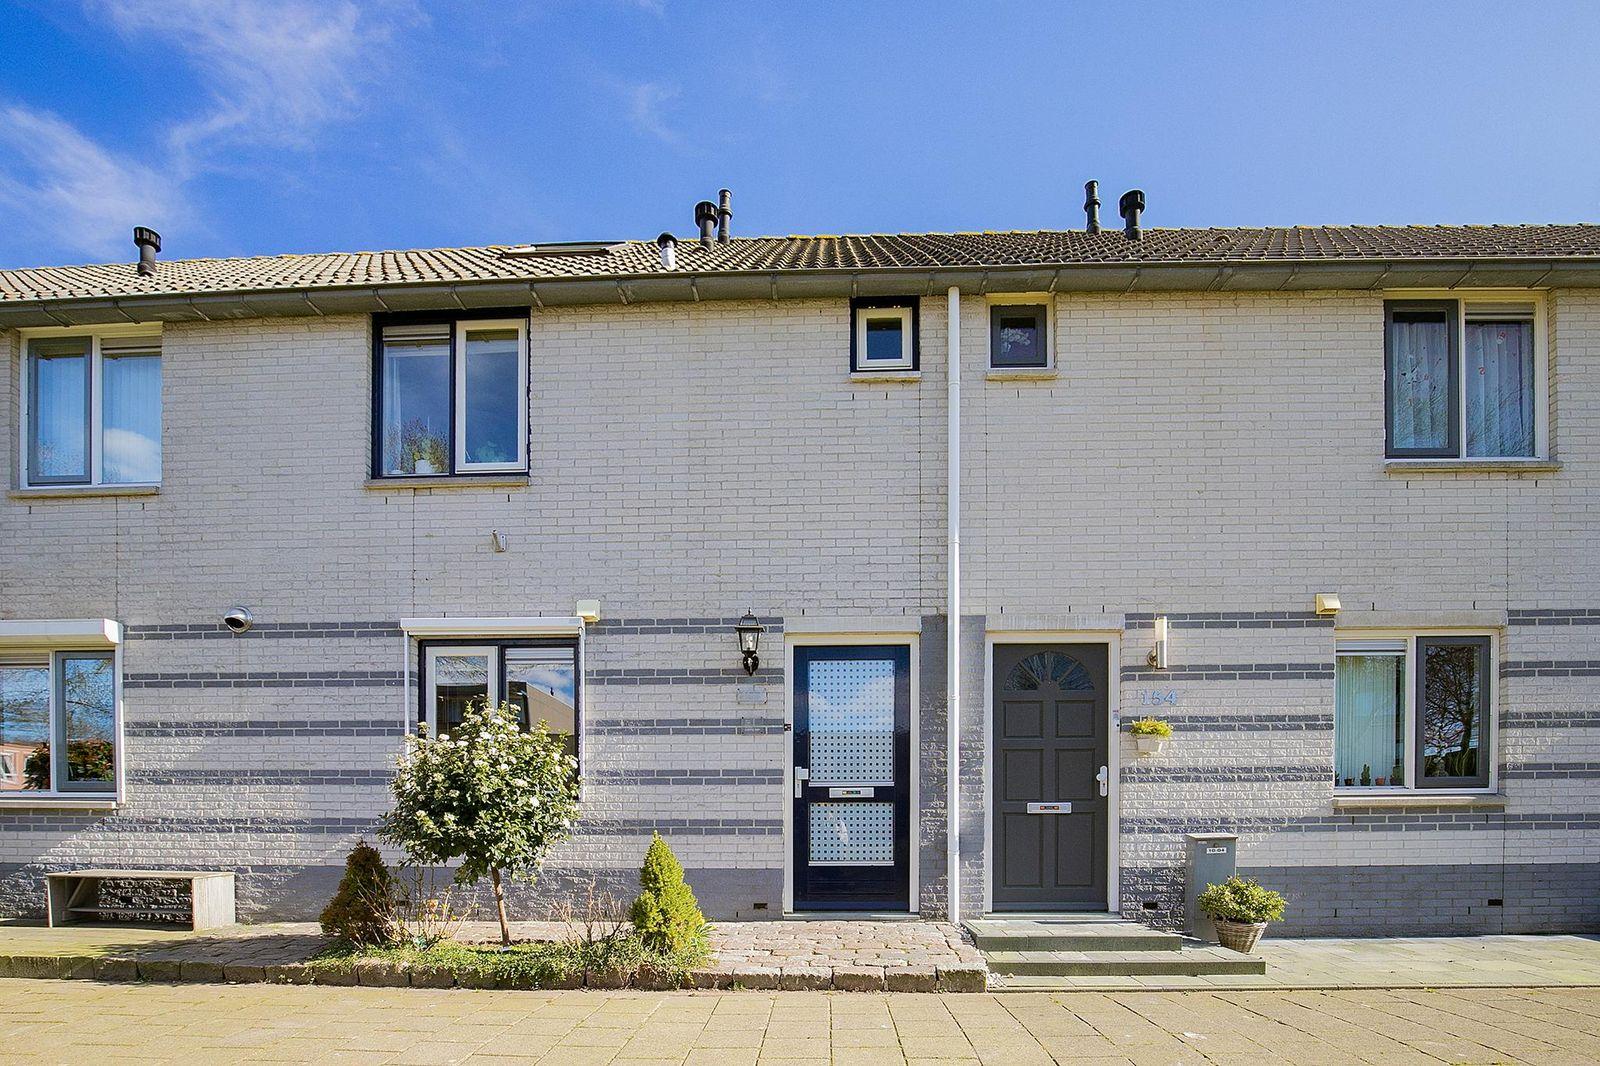 Rietveld-erf 153, Dordrecht